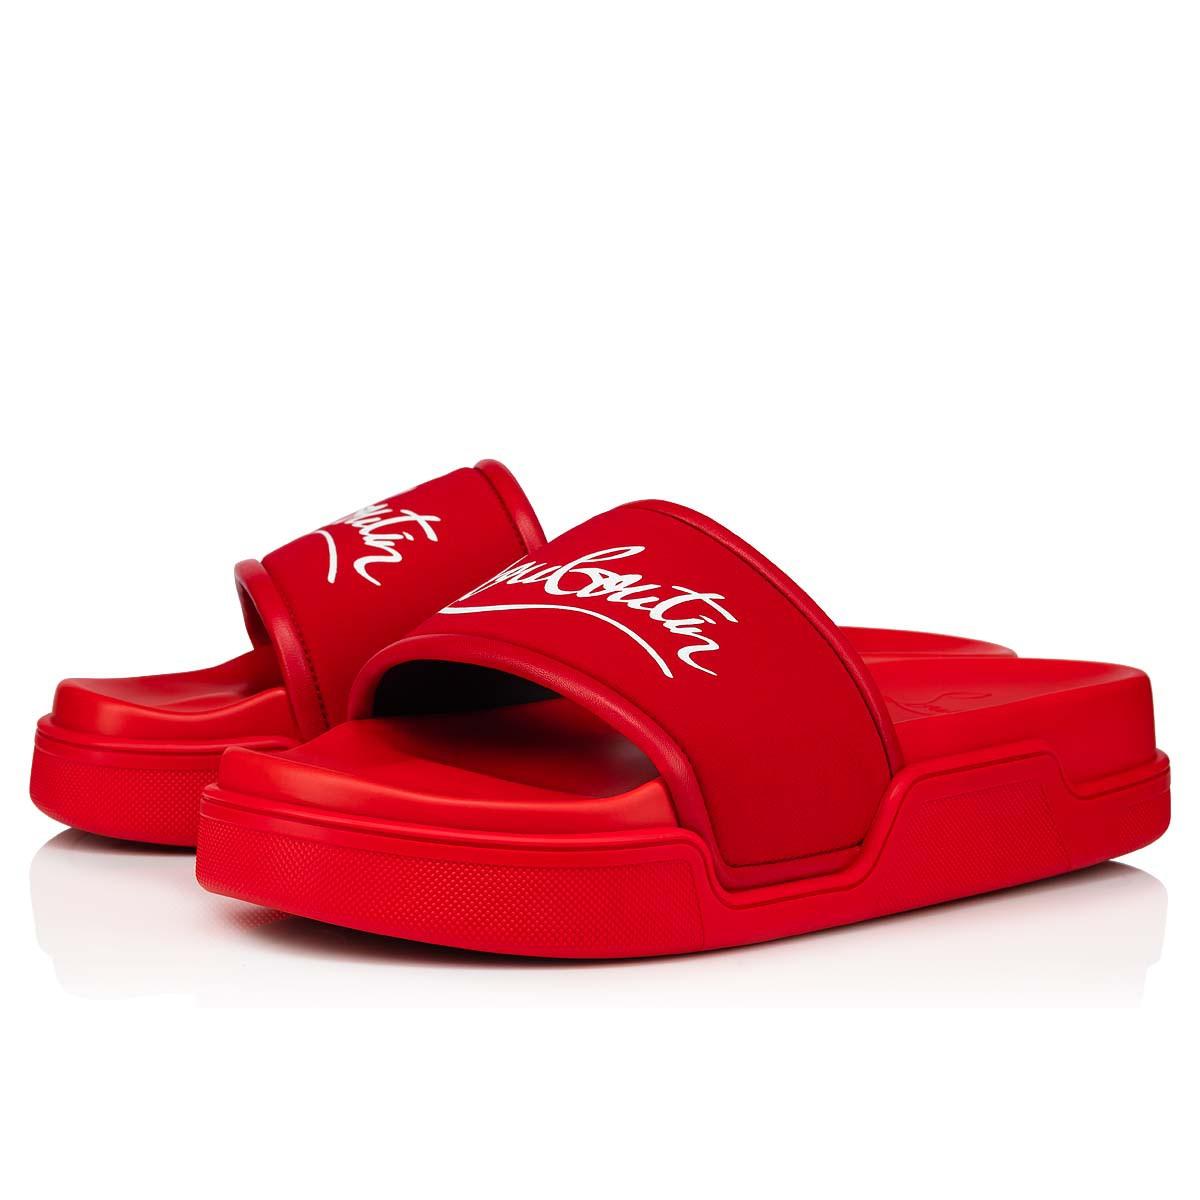 Shoes - Navy Pool Flat - Christian Louboutin